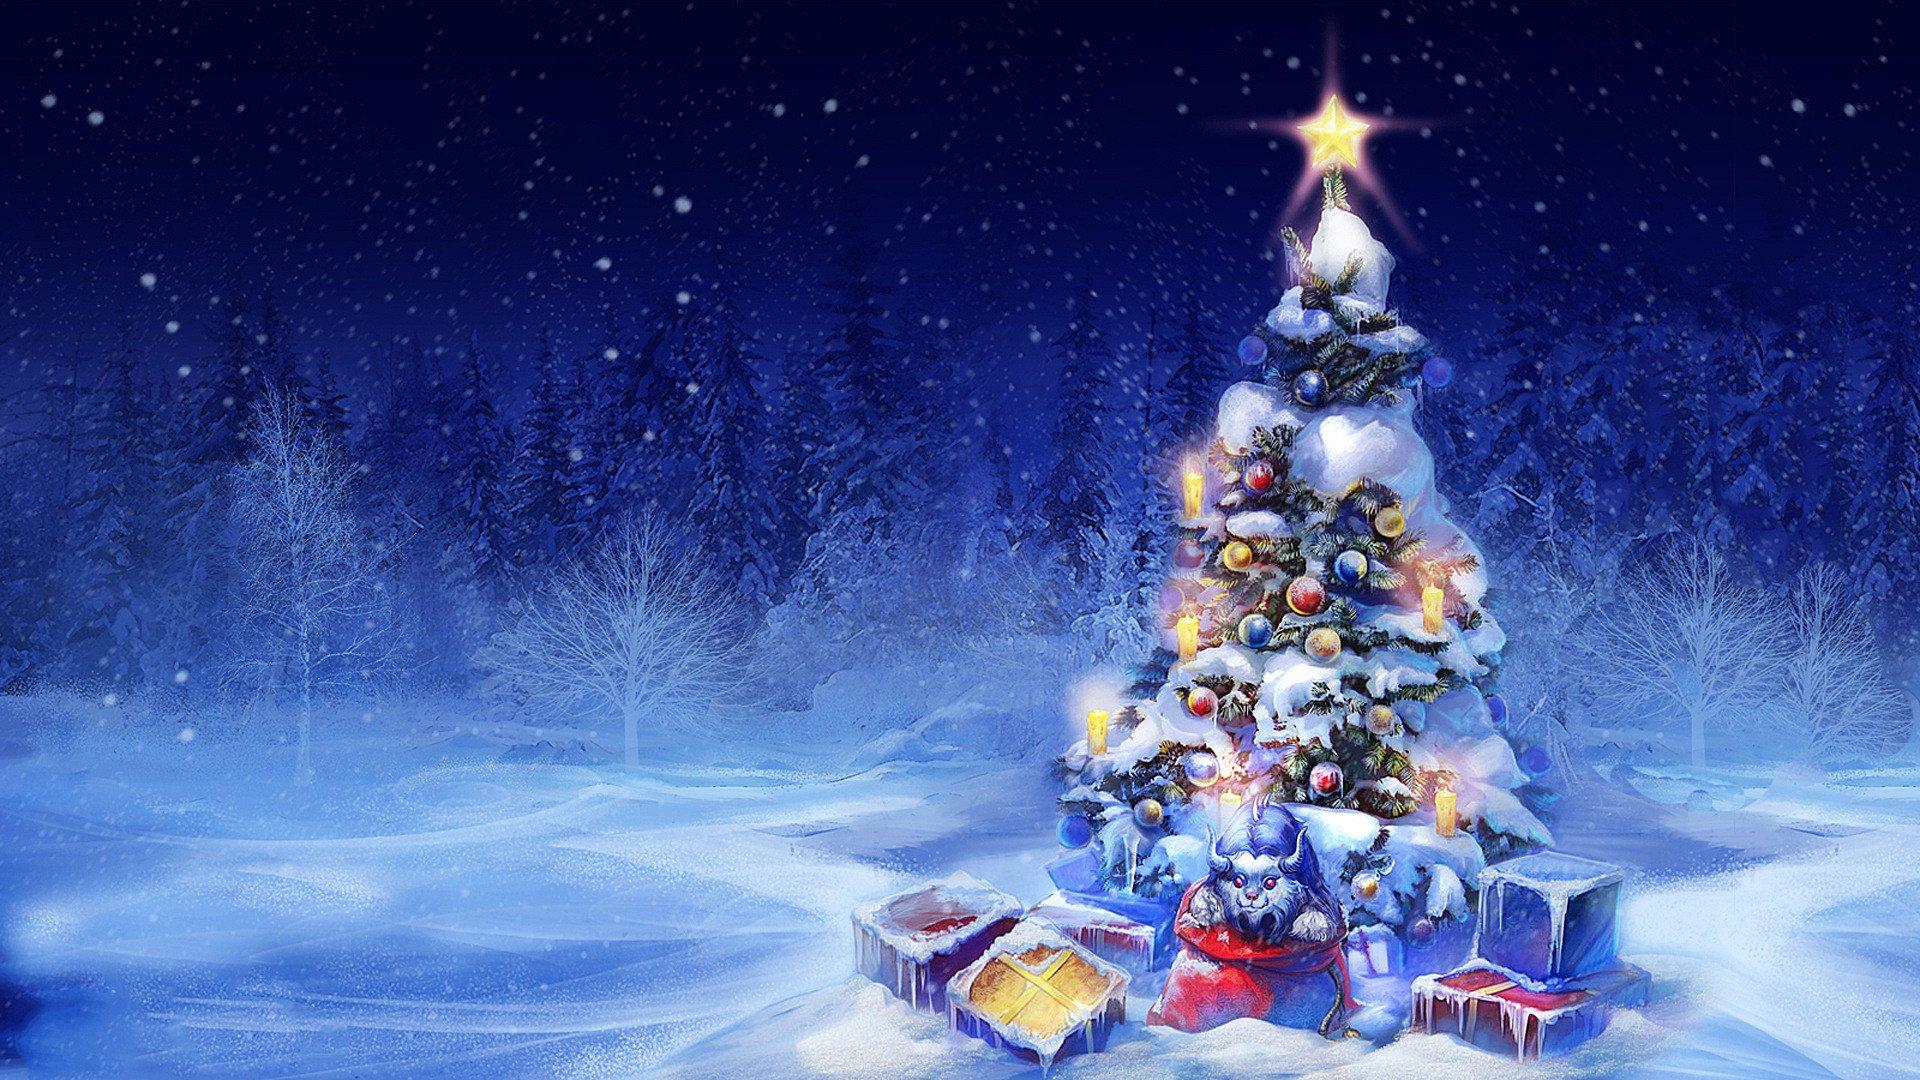 Holiday - Christmas  Holiday Winter Snow Christmas Tree Wallpaper